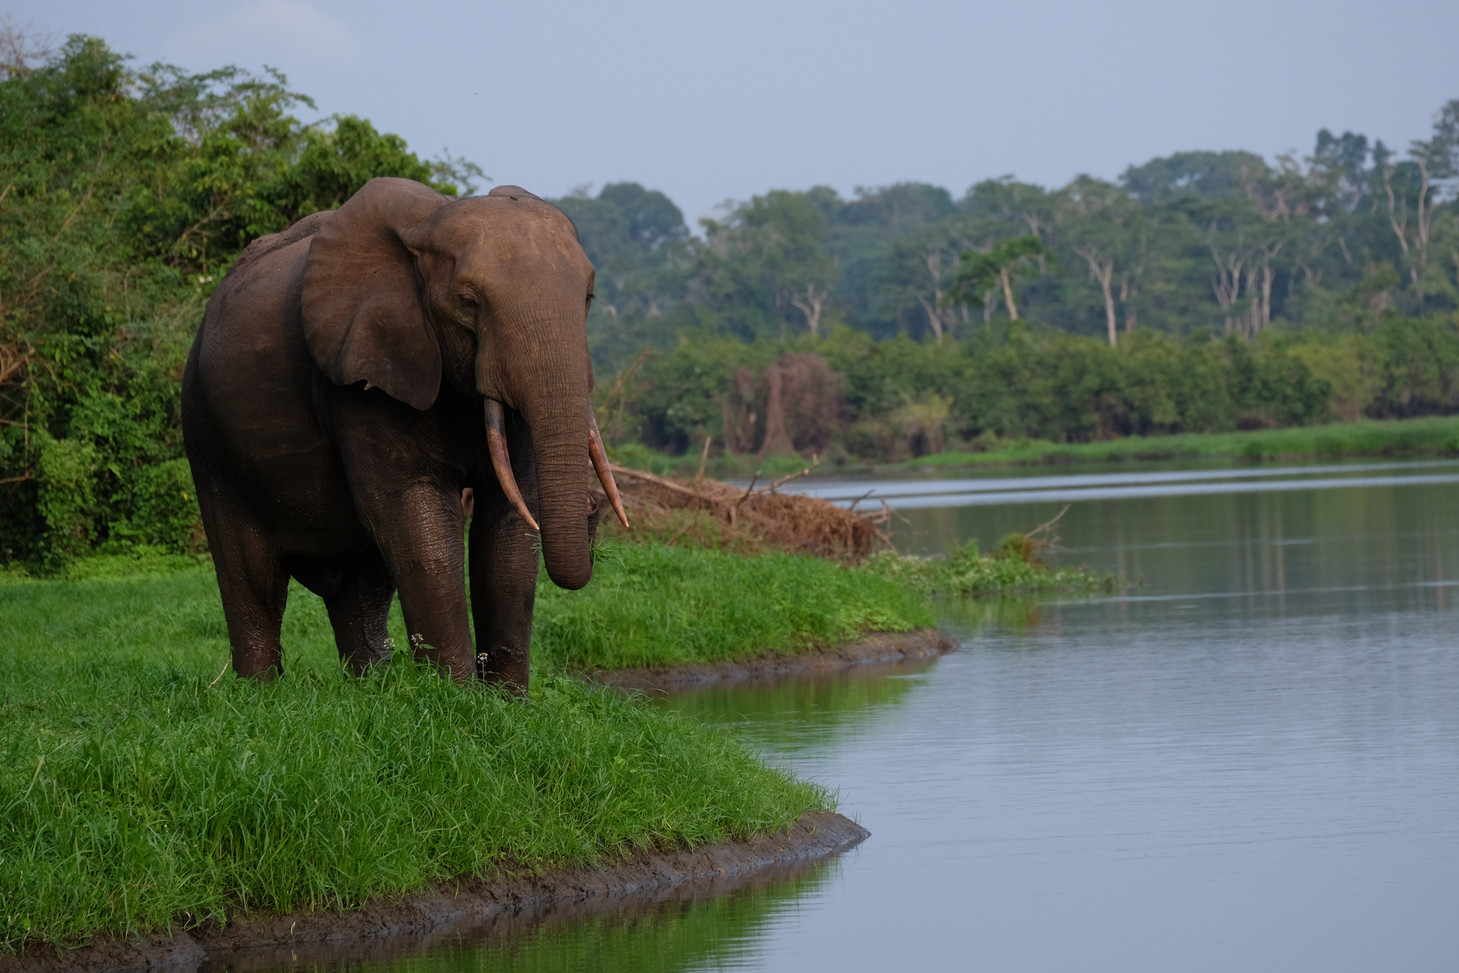 Akaka Landscape and Elephant Viewing from Boat Safari